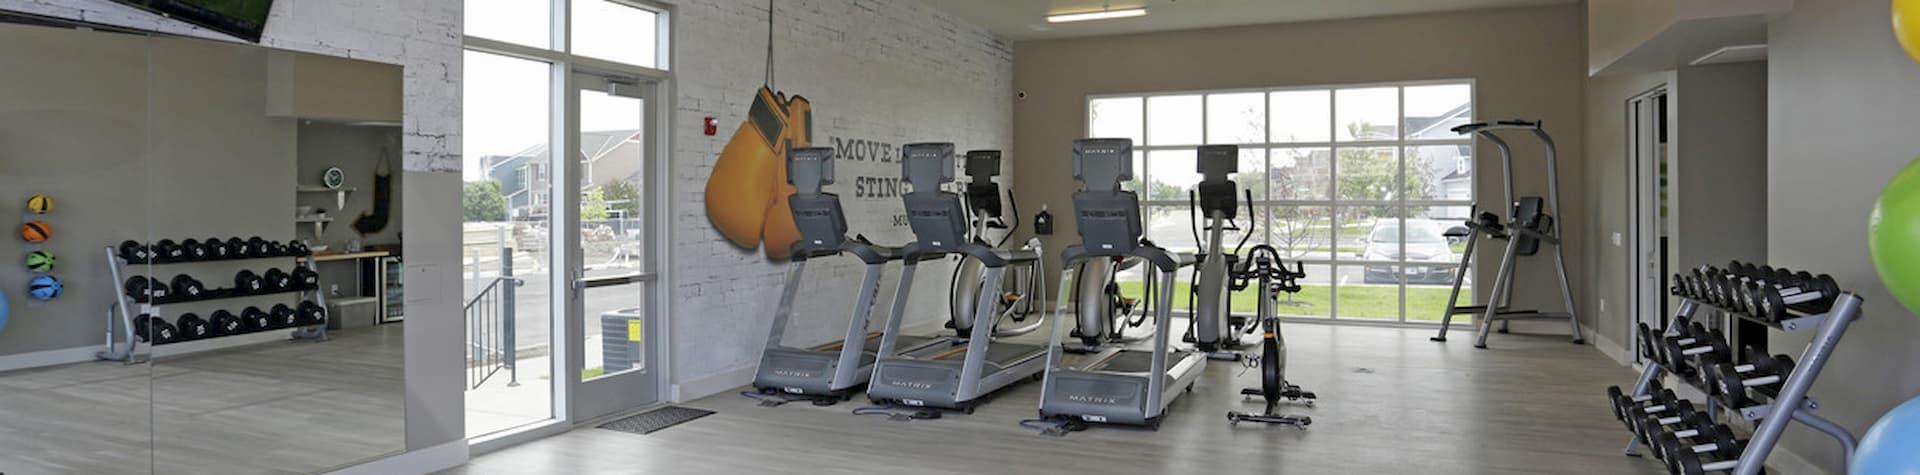 springs-at-cobblestone-lake-apple-valley-mn-fitness-center (1) (3)